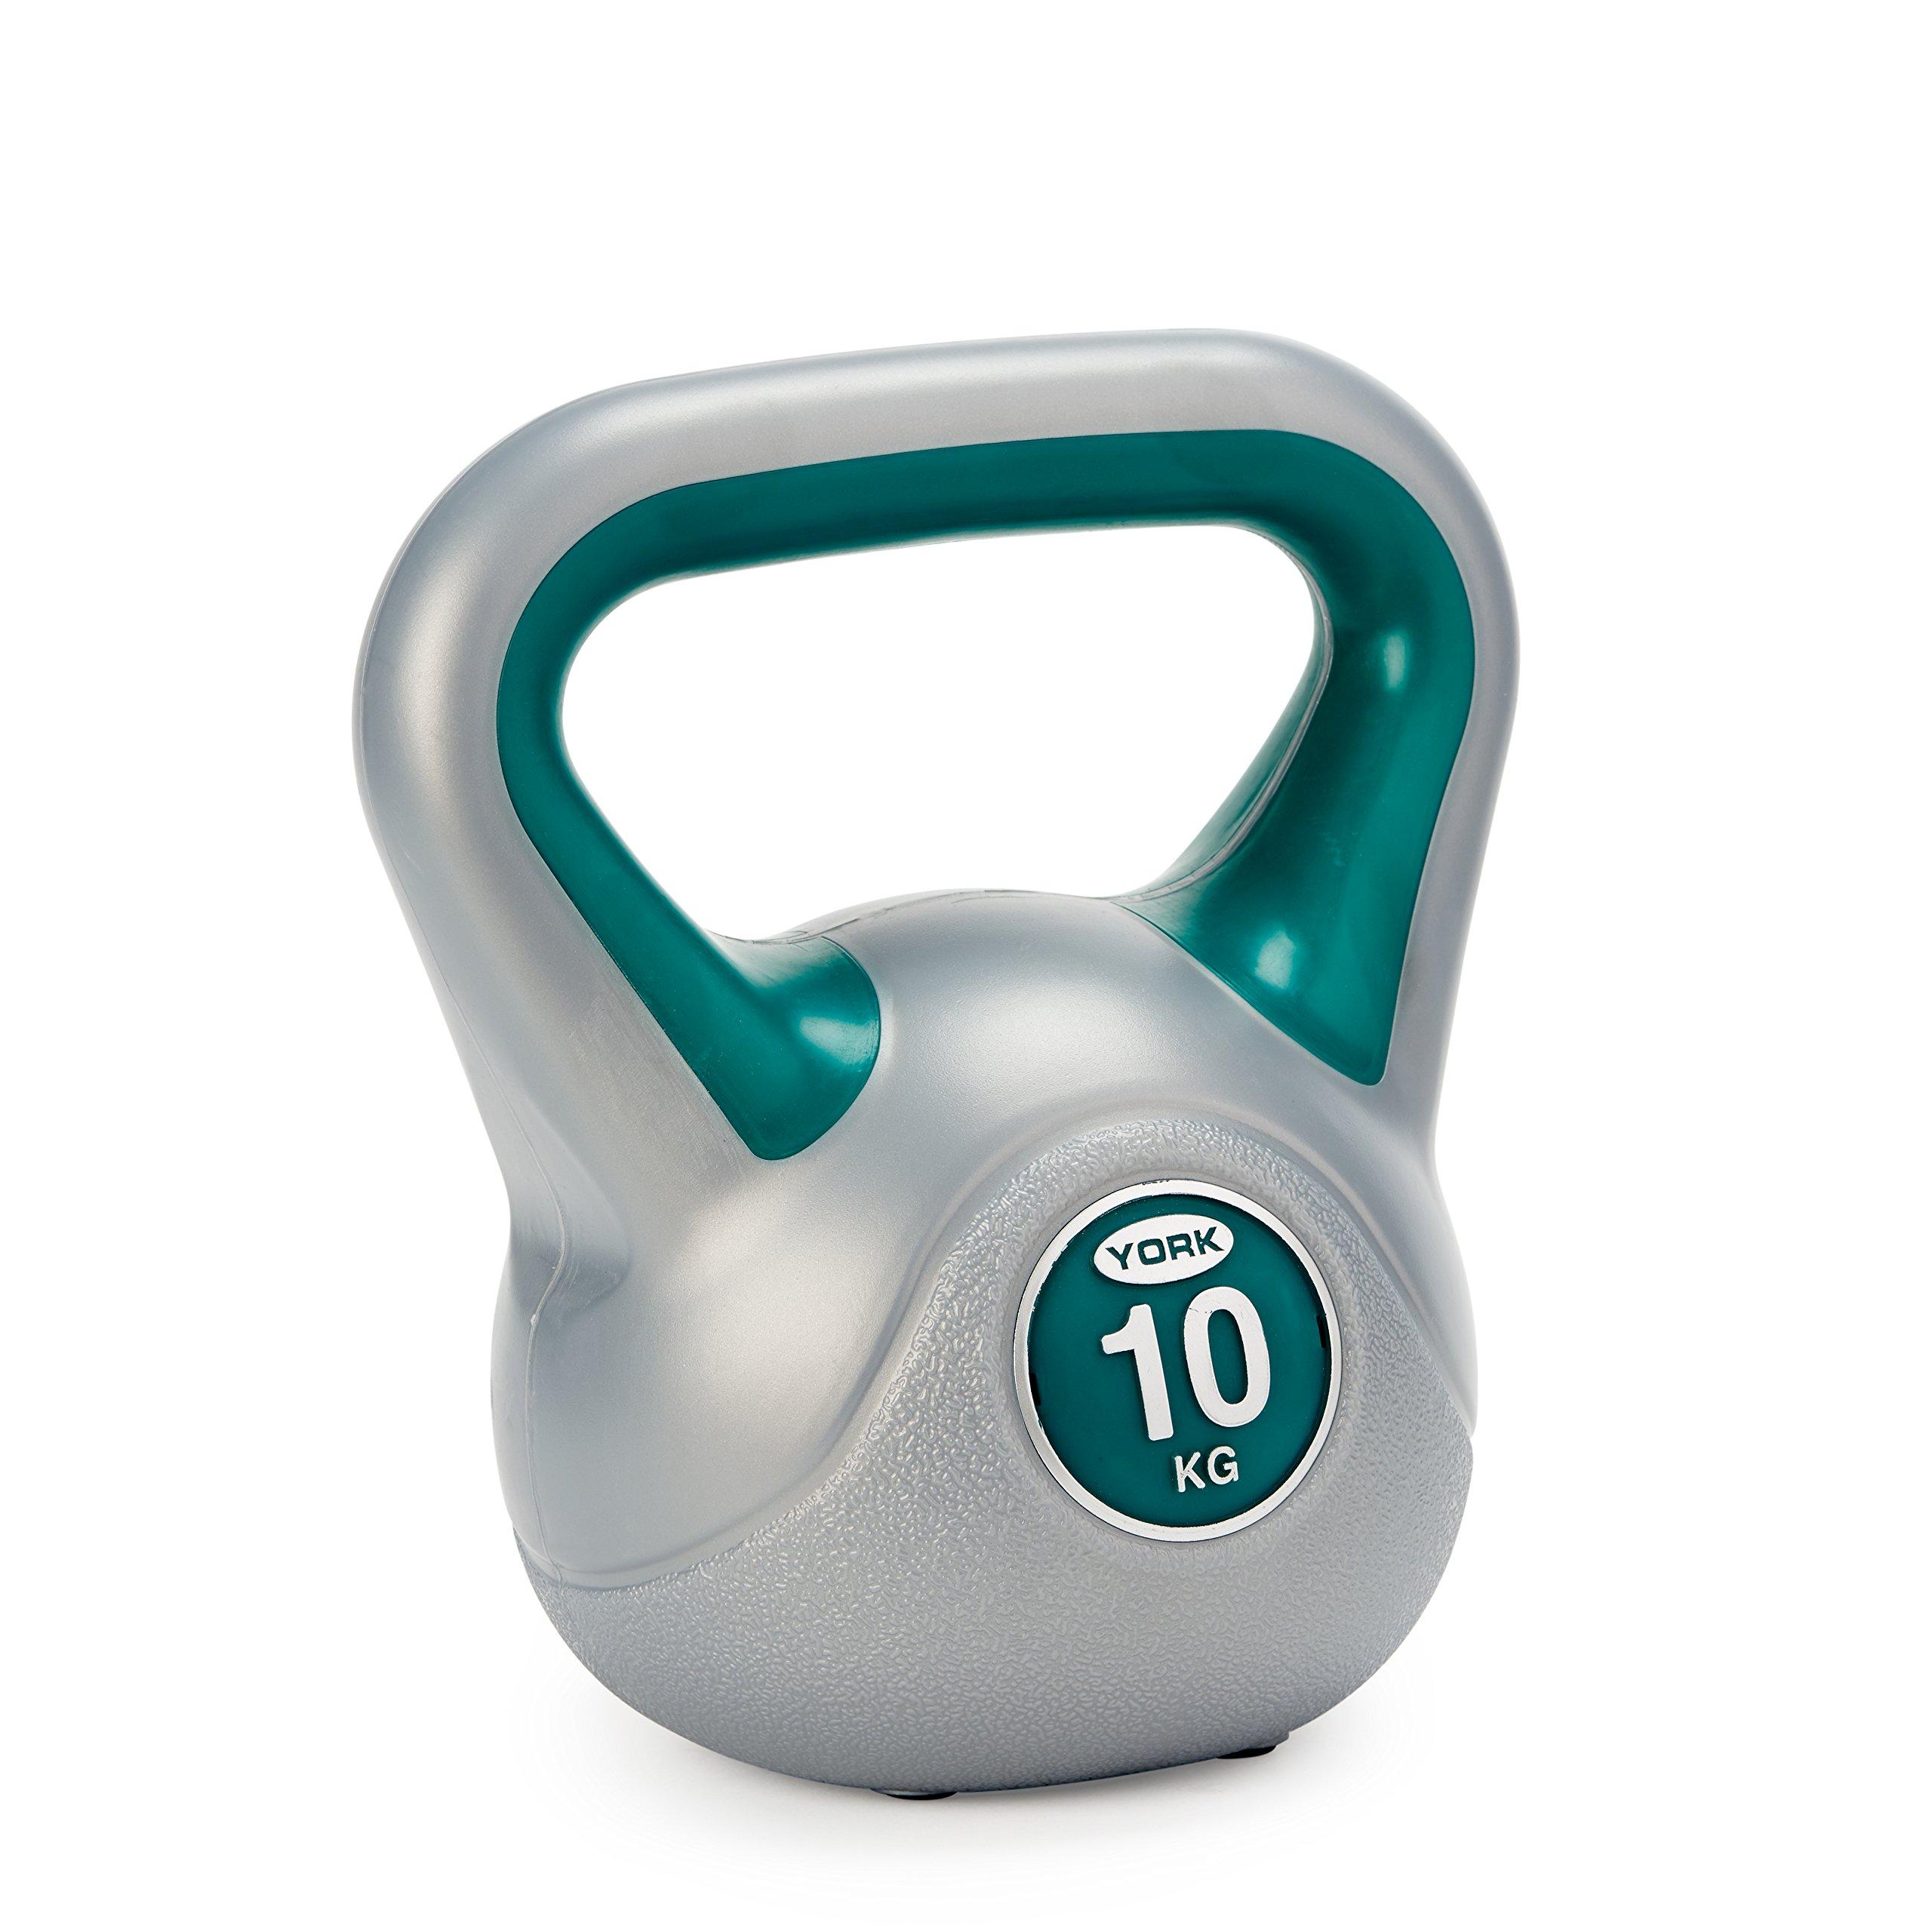 York kettle bell kettlebell Weights Gym Equipment Fitness Yoga Gym 8 8kg